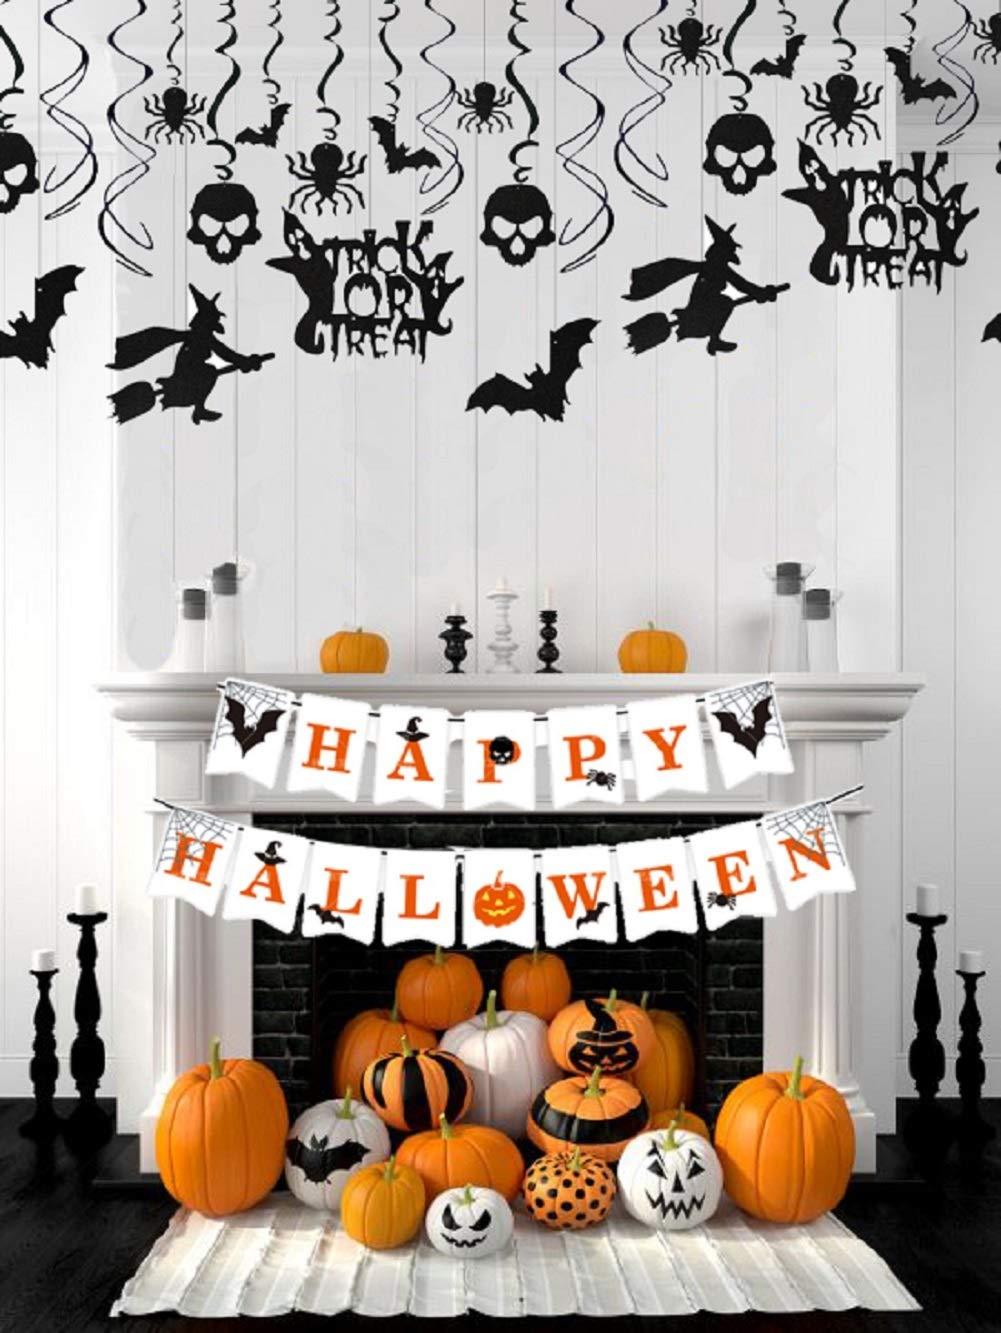 Halloween Birthday, Trick or Treat Banner Trick or Treat Bunting Halloween Party Halloween Decorations Halloween Backdrop